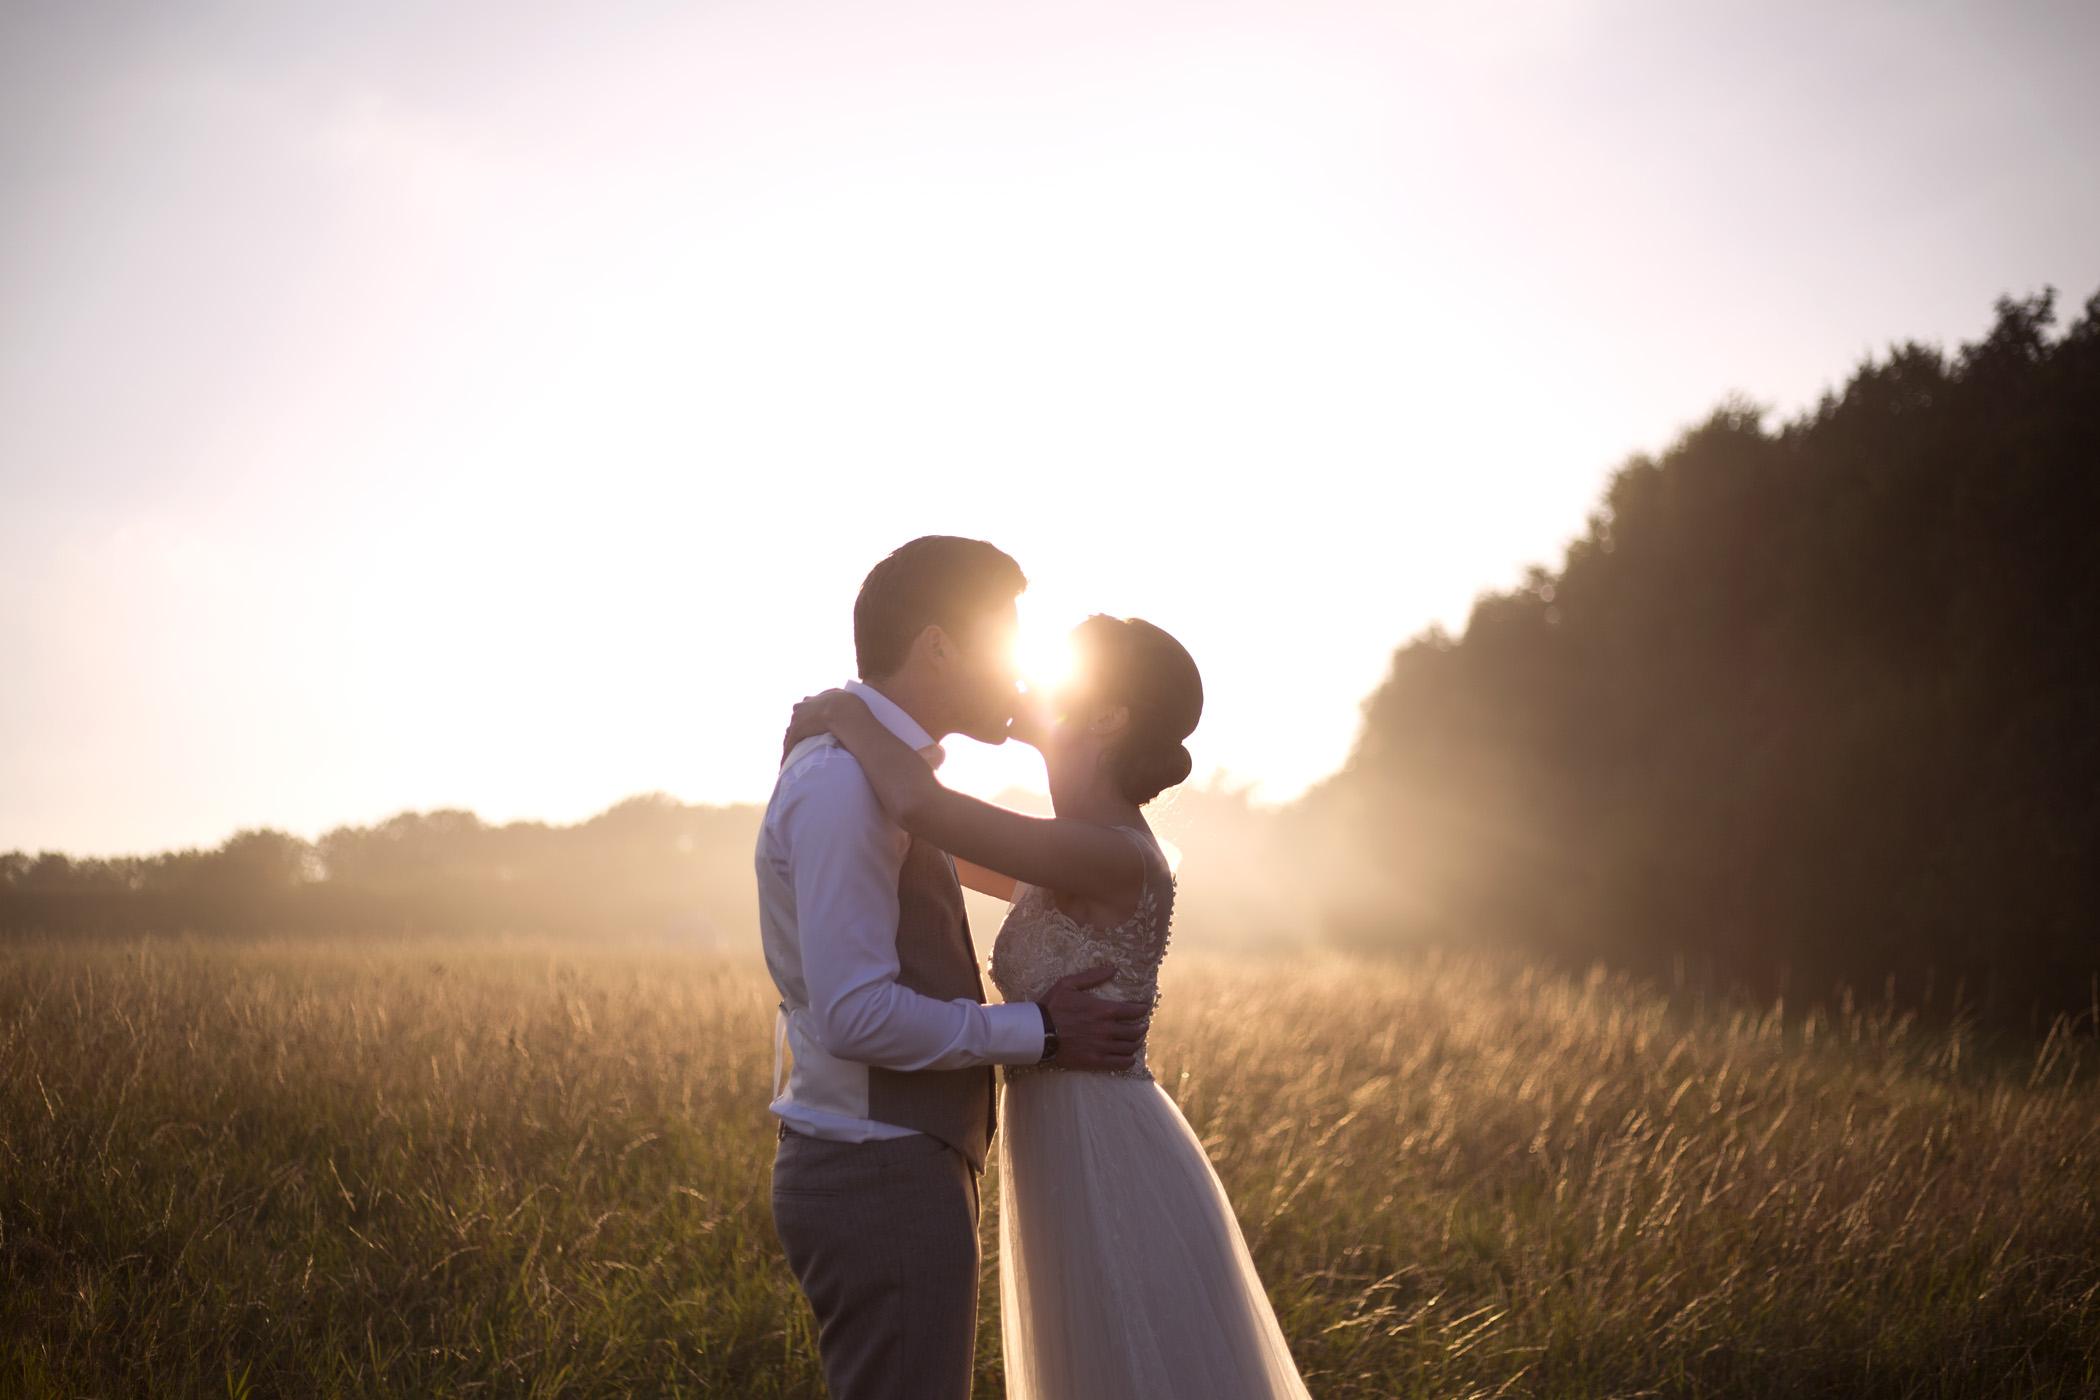 Bride and groom kiss silhouette golden hour sunset Cripps barn outdoor wedding photographer